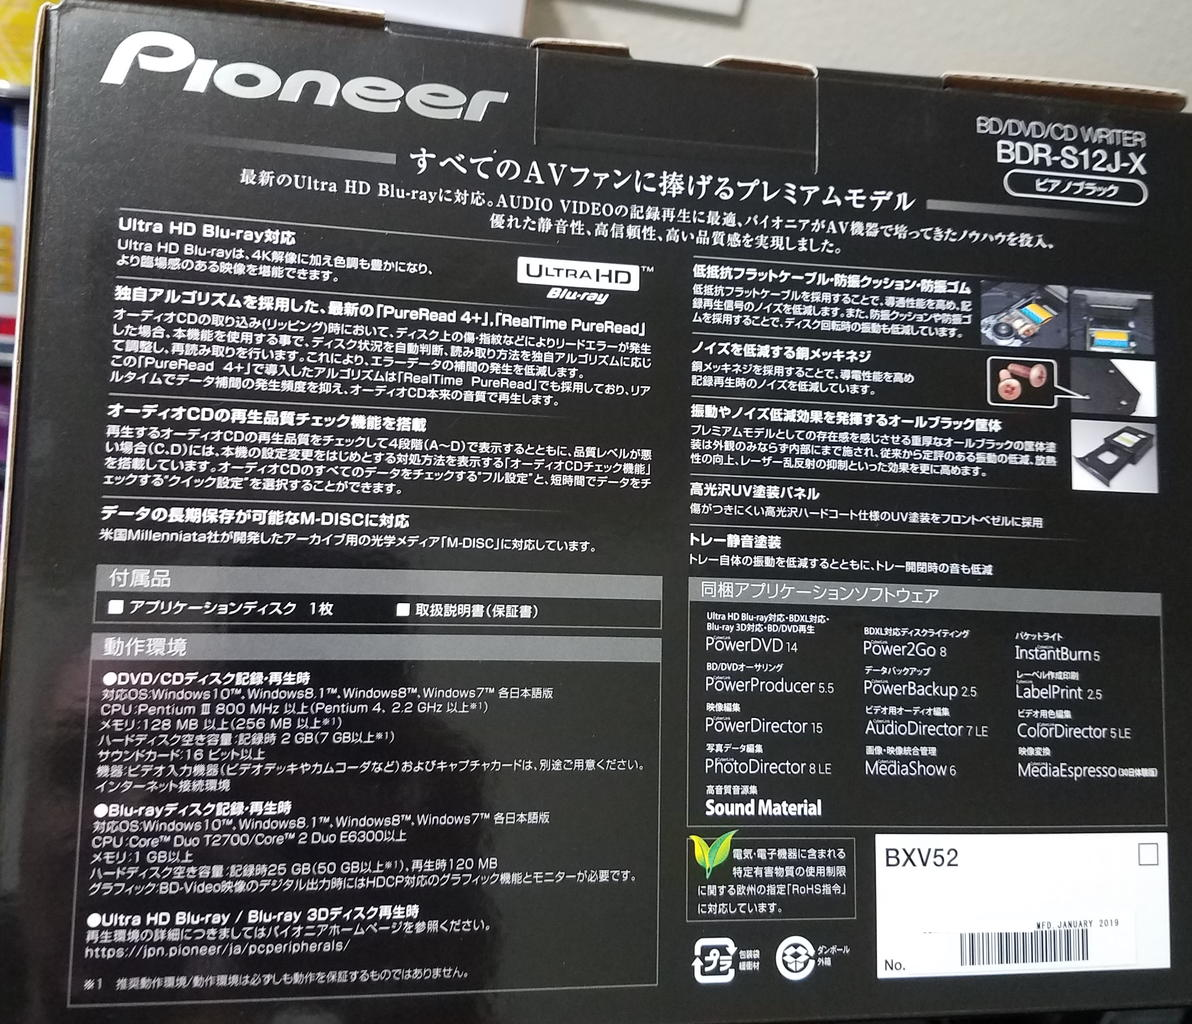 https://forum.cdrinfo.pl/attachments/f107/133696d1551679989-pioneer-bdr-s12j-bk-bdr-s12j-x-bdr-212-ultra-hd-blu-ray-box-back.jpg